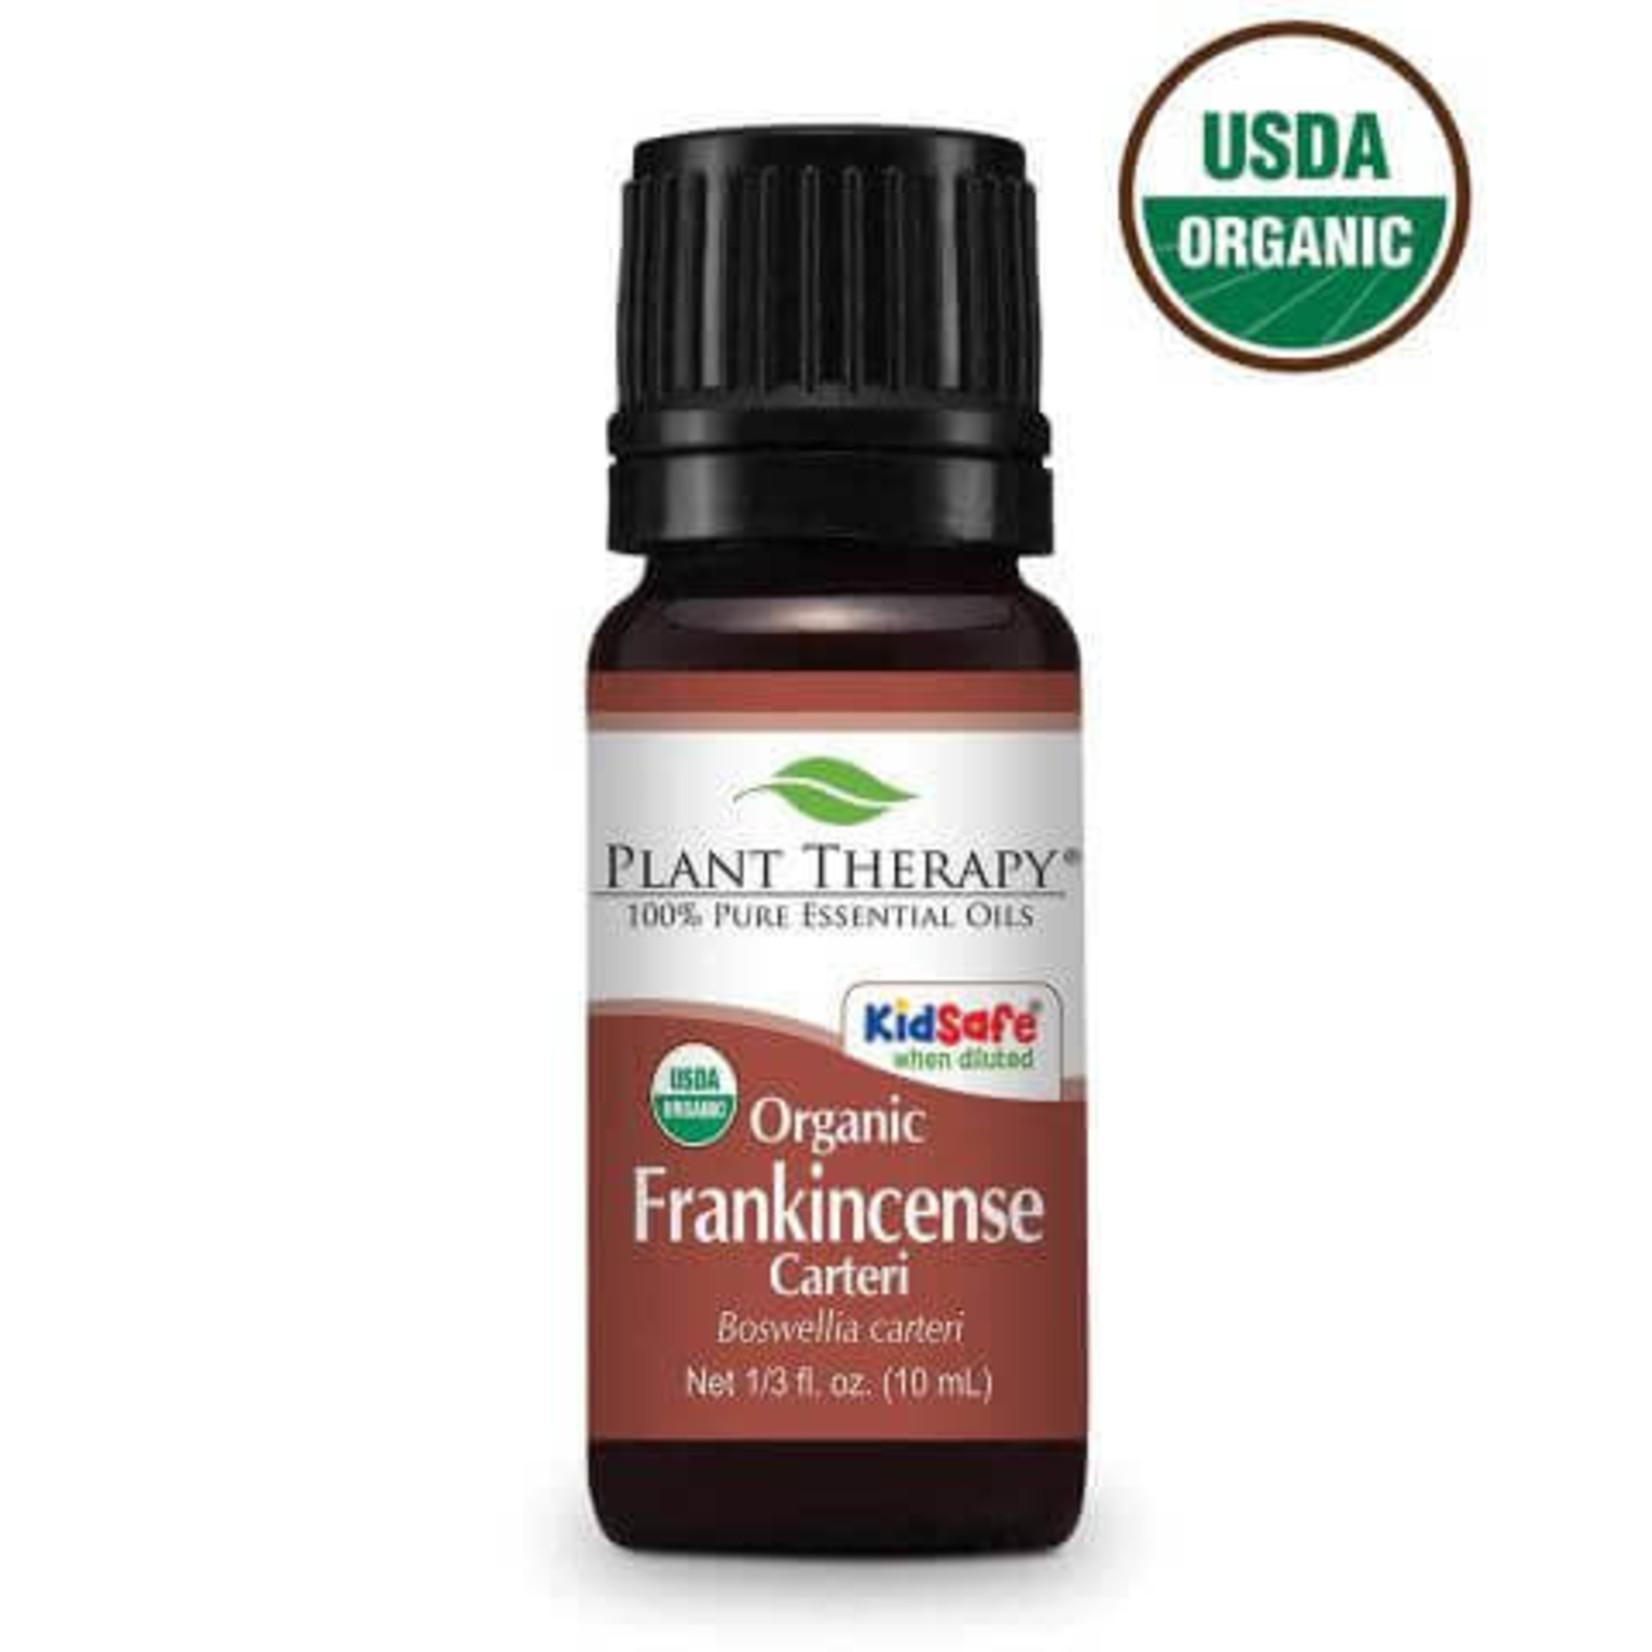 Plant Therapy PT Frankincense Carteri Organic Essential Oil 10ml